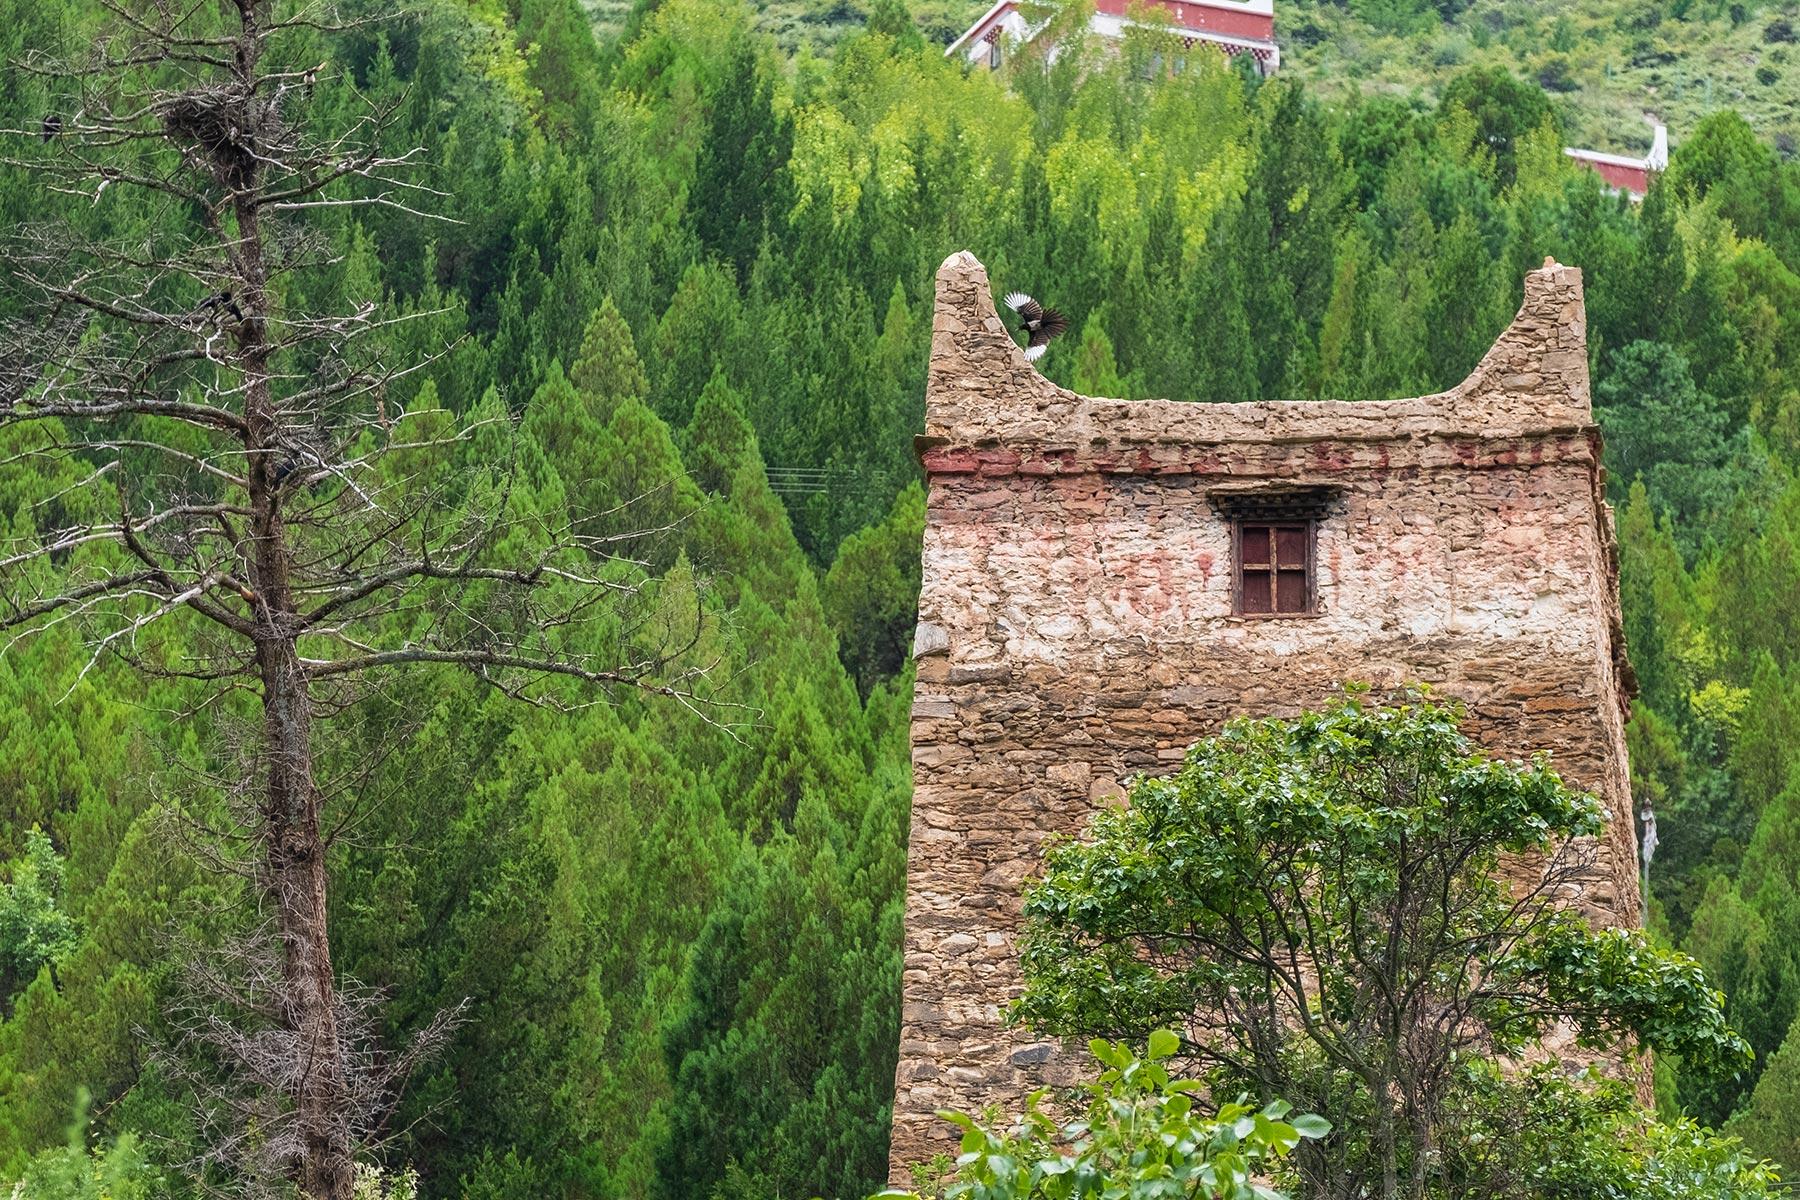 Turm aus Stein im tibetischen Dorf Danba Zangzhai in China